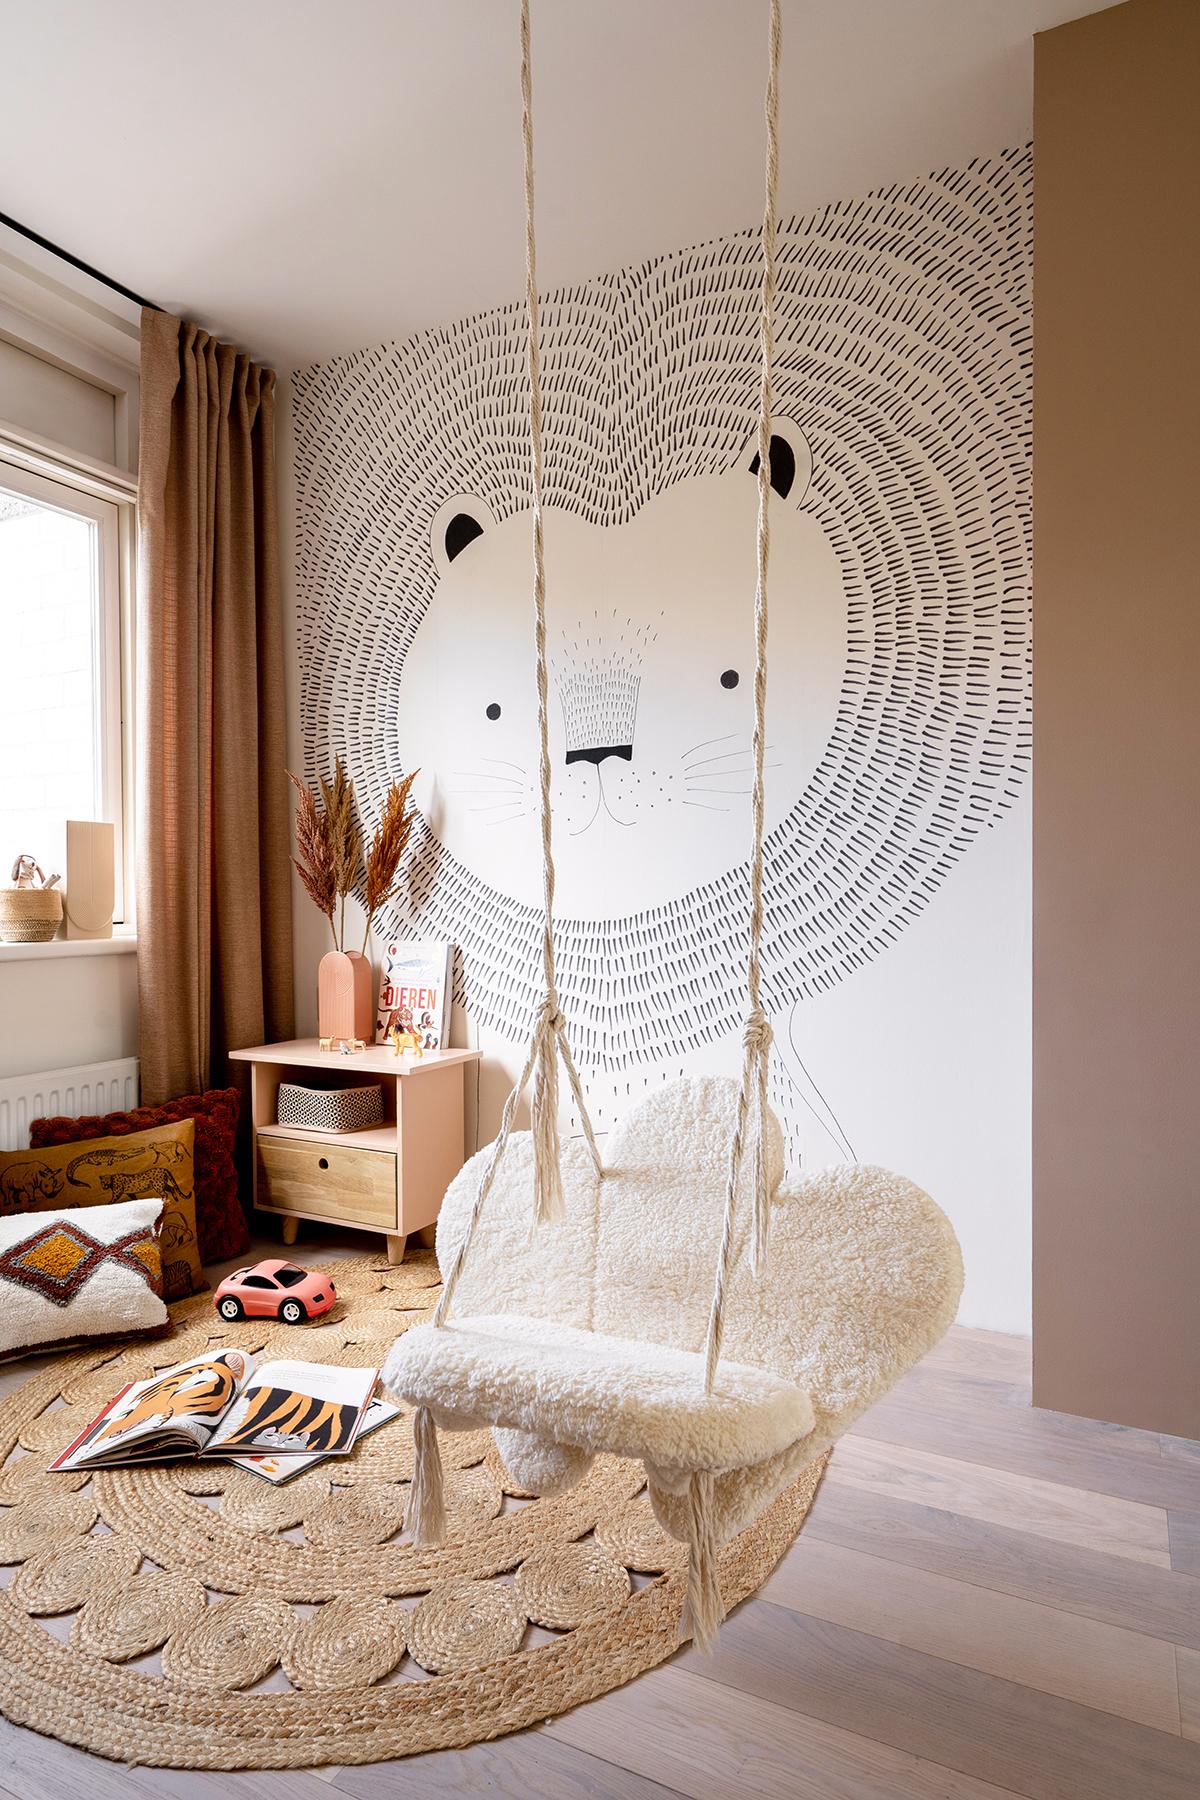 DIY hangstoel kinderkamer - Tanja van Hoogdalem